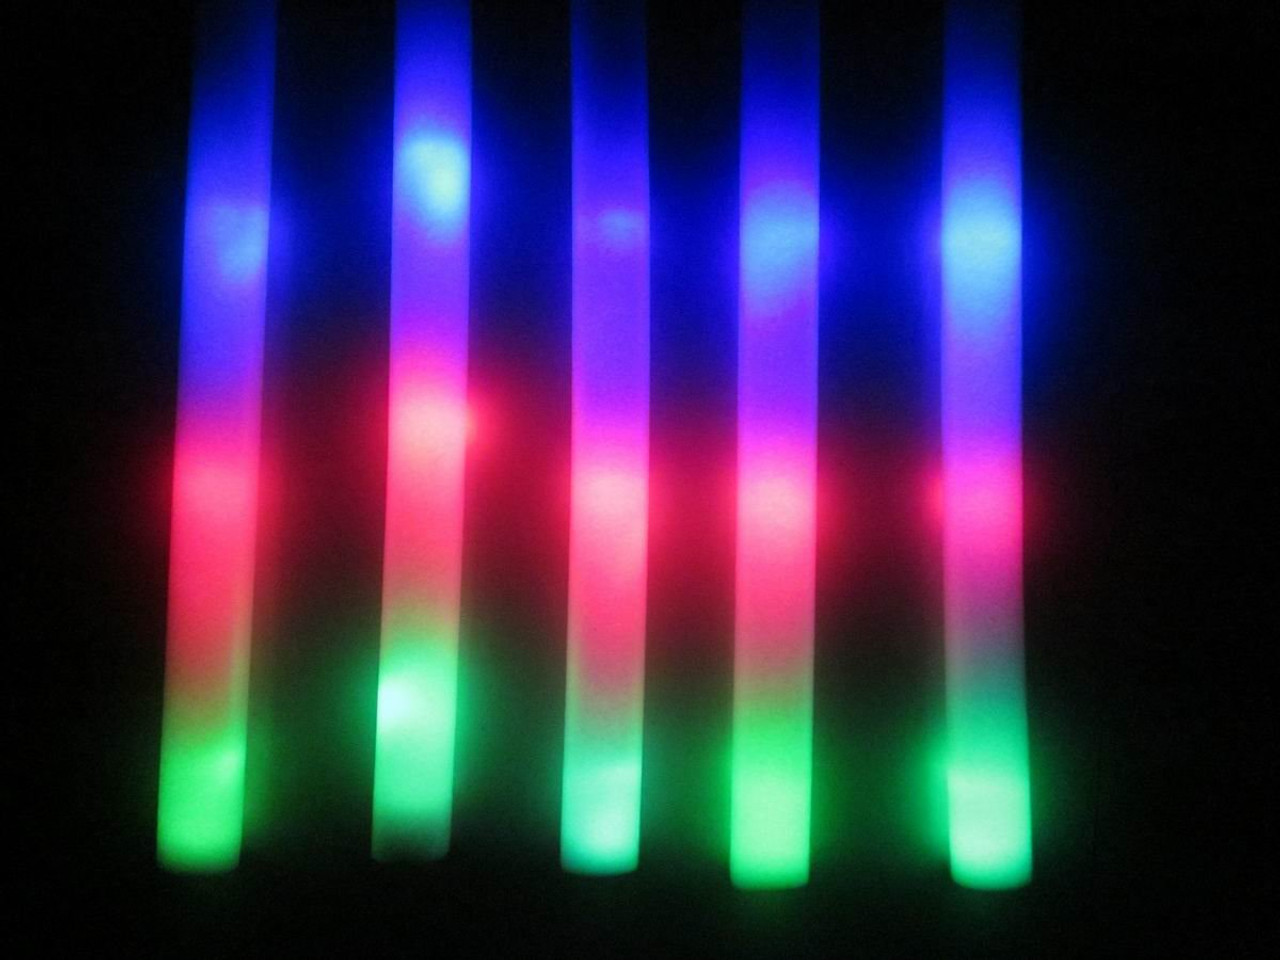 "stick, Foam,Stick, Glow,Baton, Glowsticks, Glowstix18"", Plain, blank , LED, Foam"